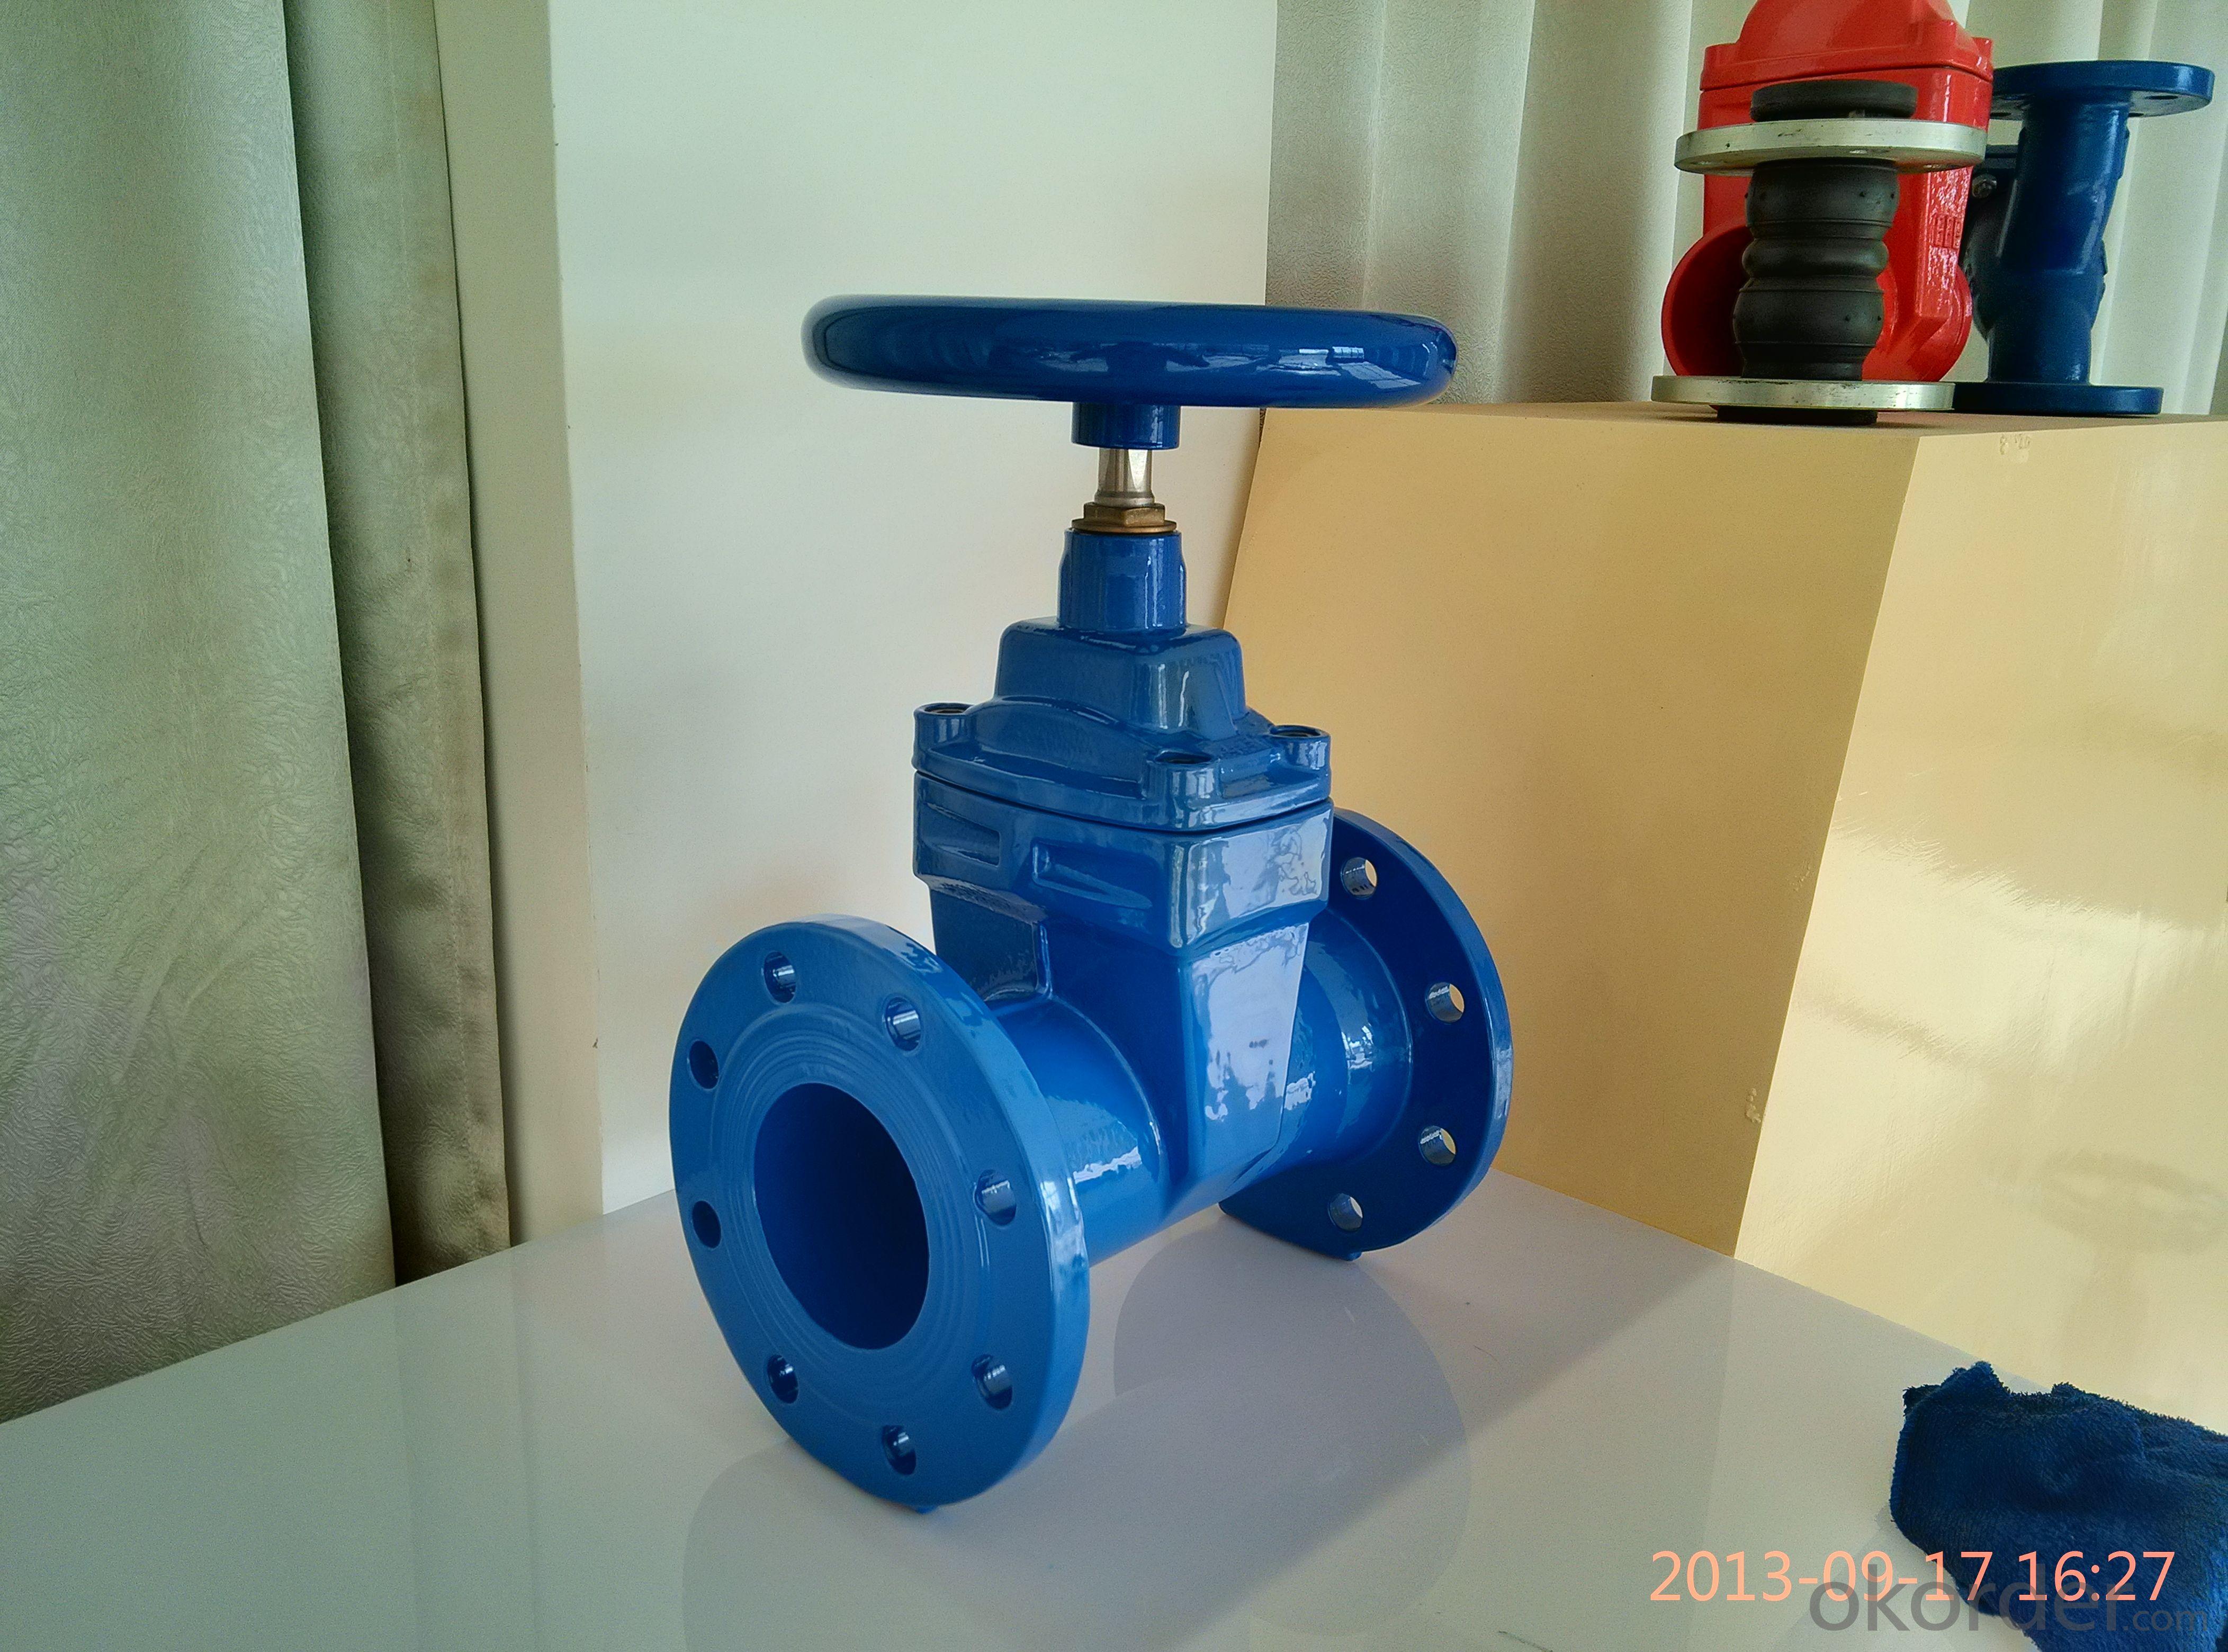 CNBM Ductile iron  gate valve 2''-12'' DIN /BS EN /ISO